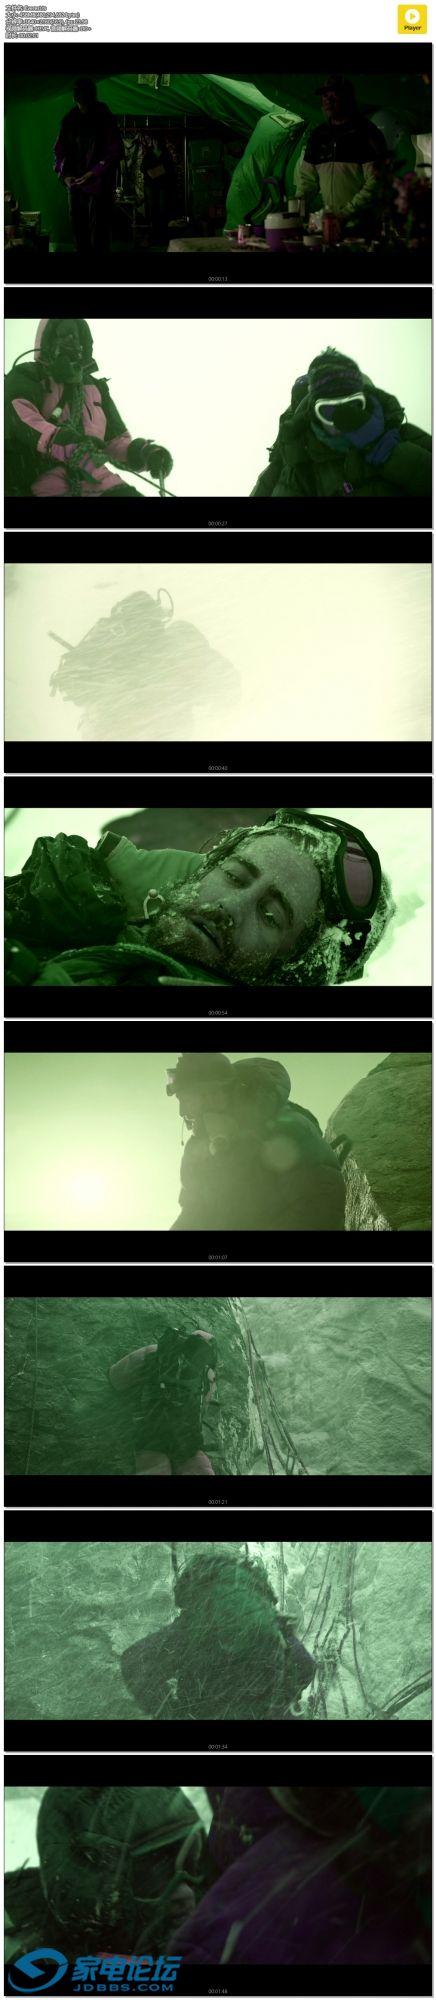 Everest.ts.jpg